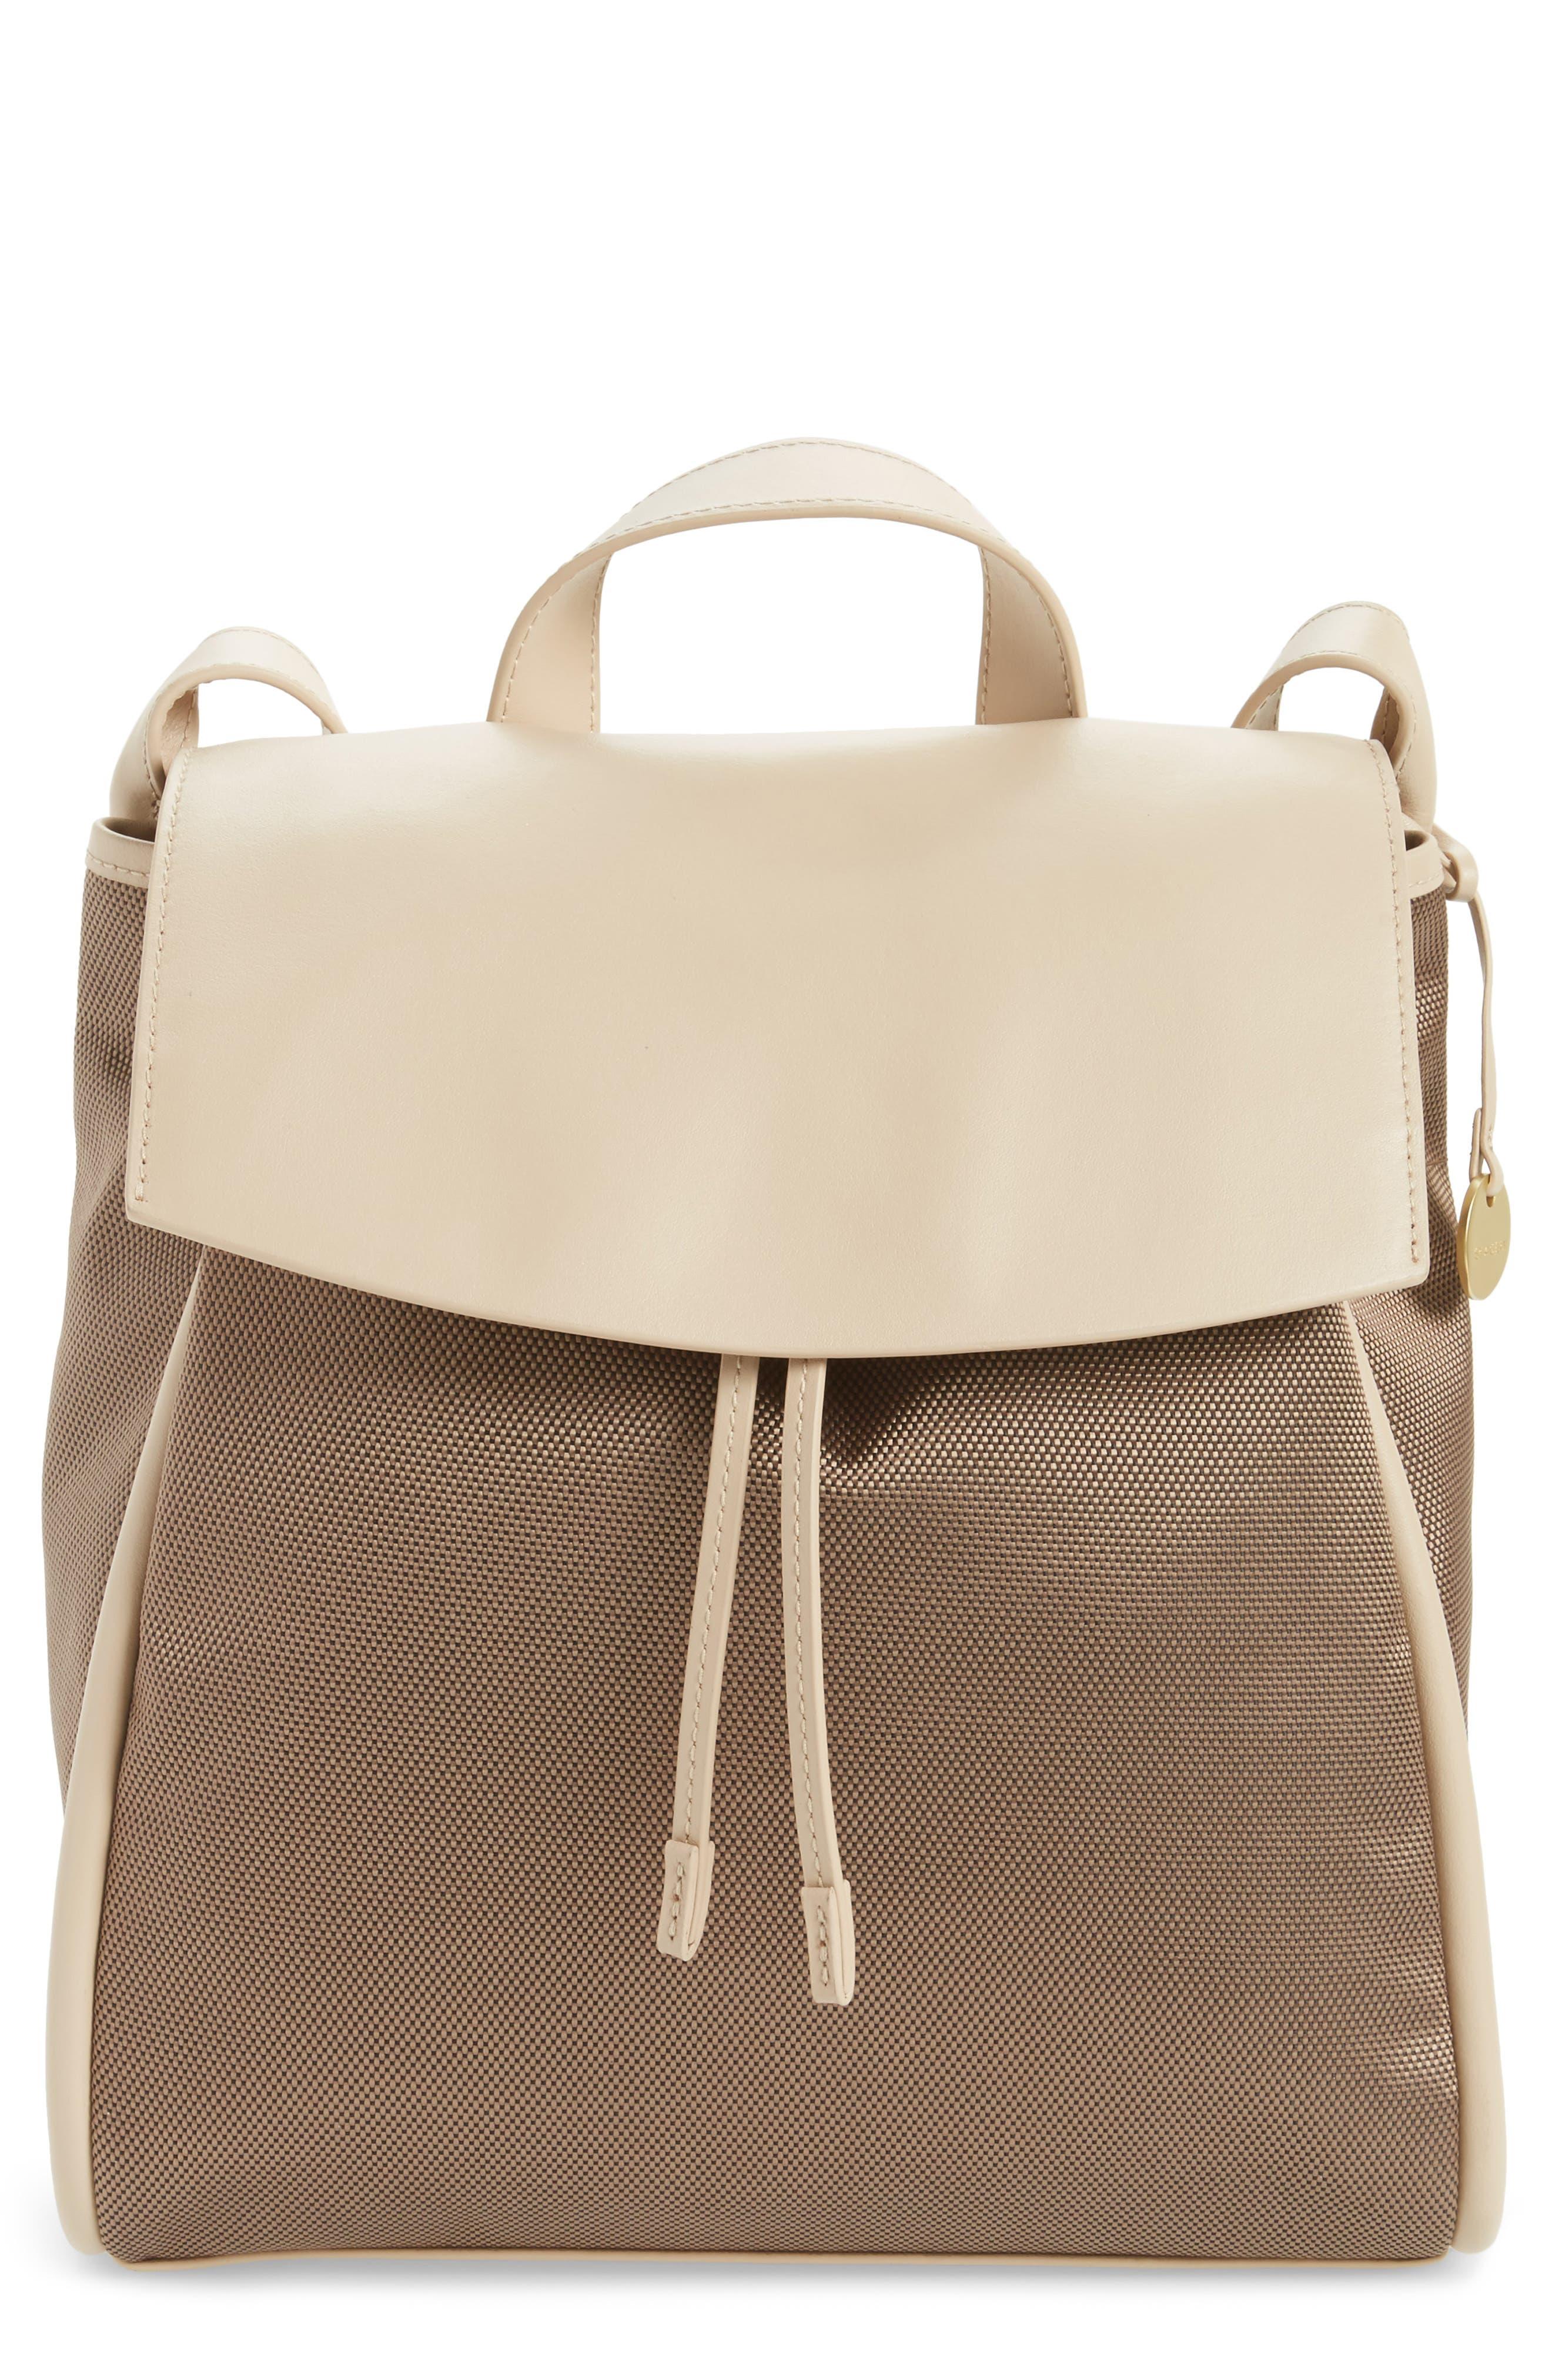 Skagen Ebba Leather & Canvas Backpack